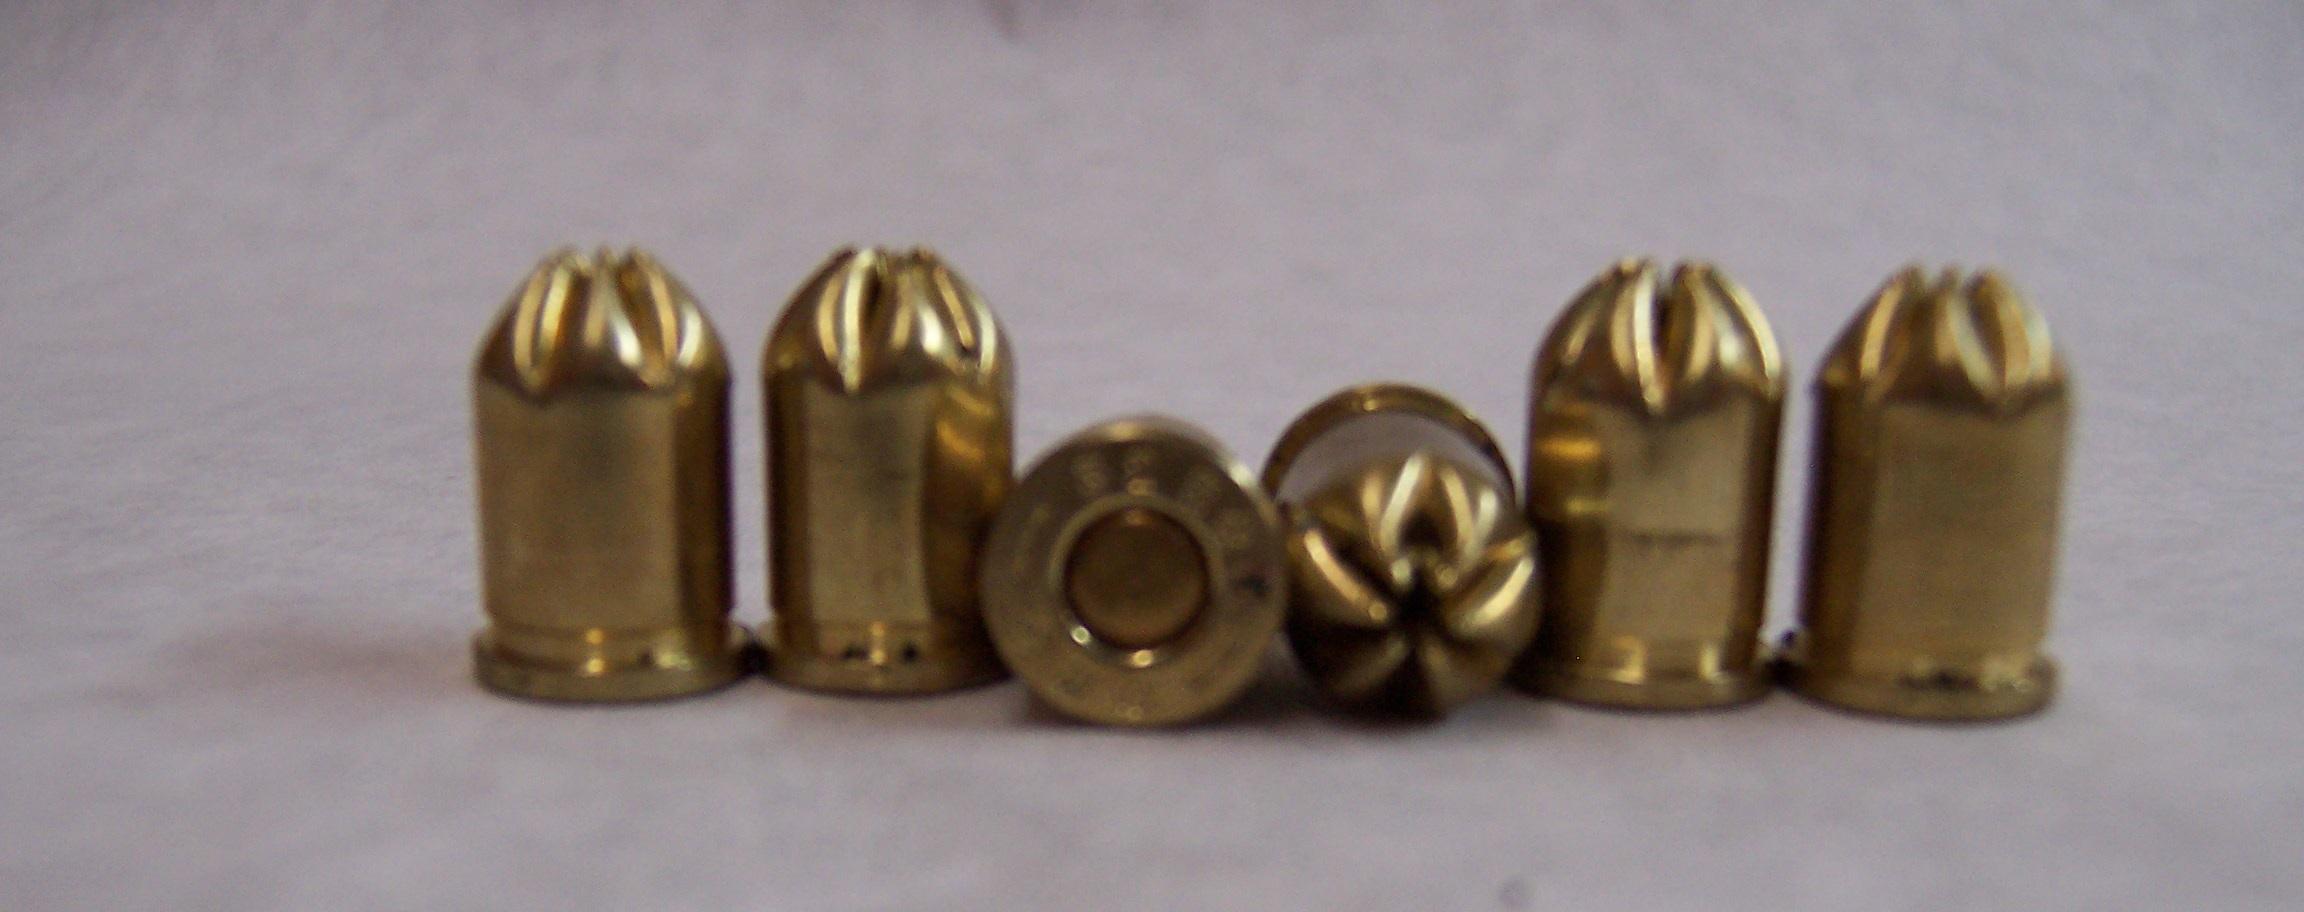 32 S&W CAL HALF LOAD NON CORR BLANK AMMUNITION for CARTRIDGE GUNS